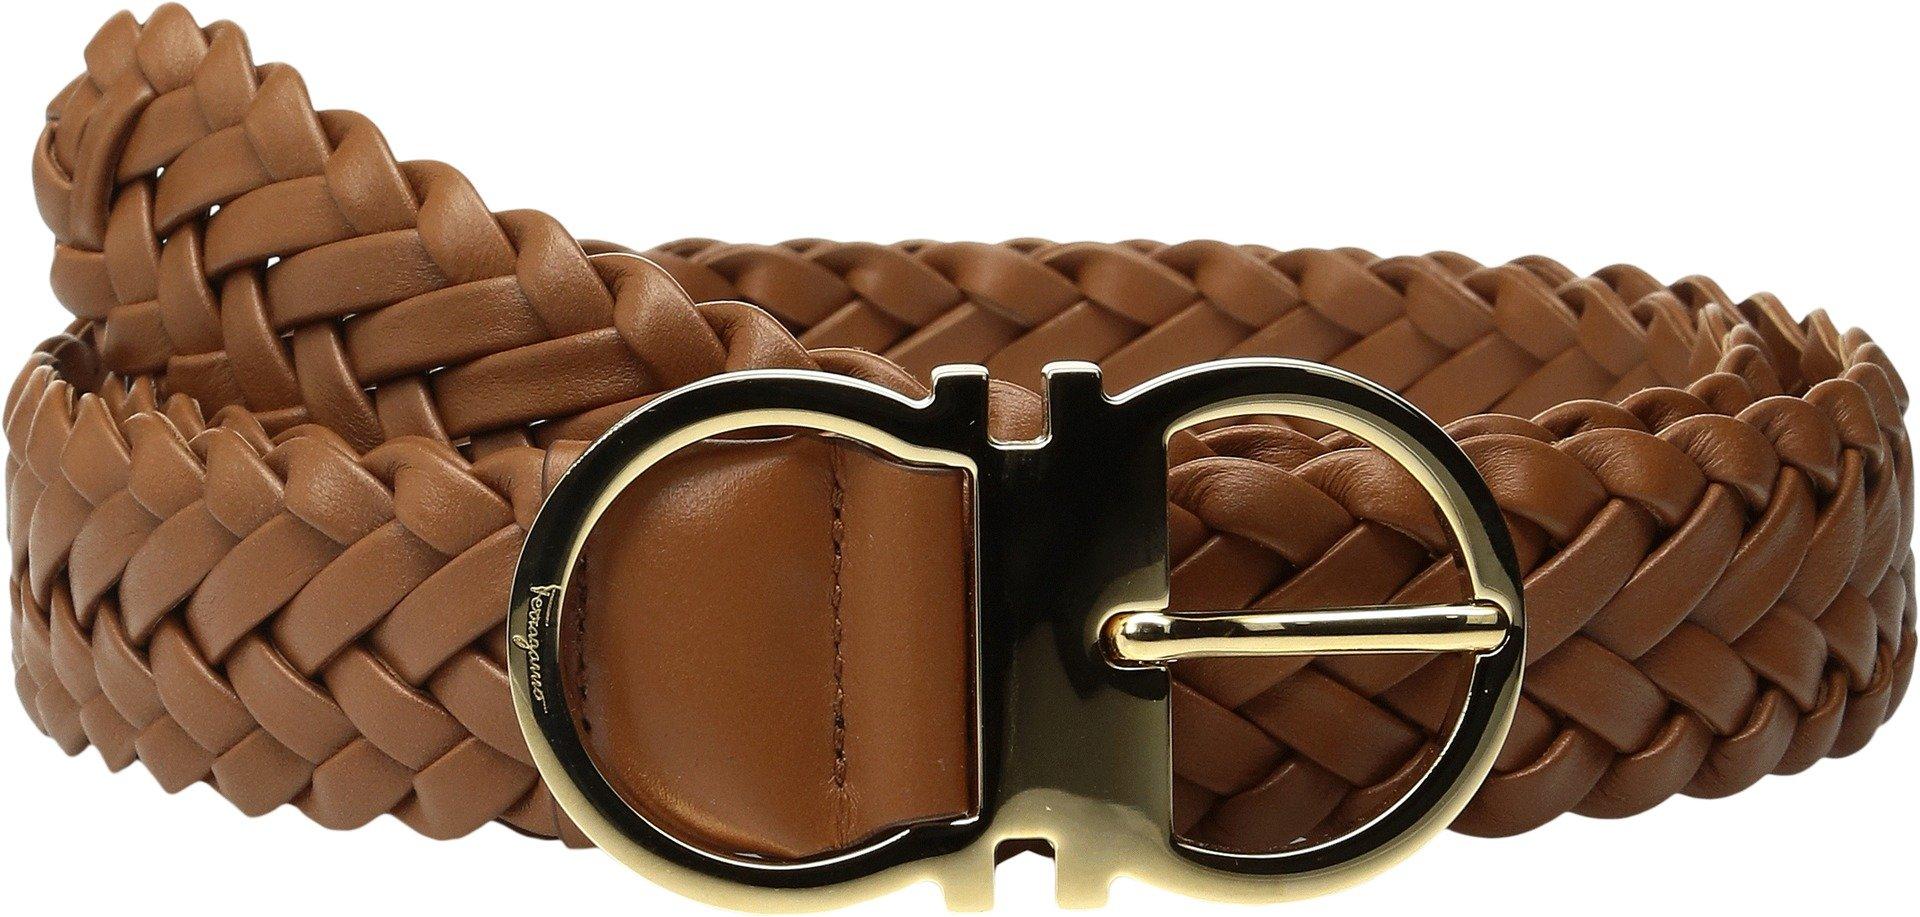 Salvatore Ferragamo Women's 23B407 Belt Sella Belt by Salvatore Ferragamo